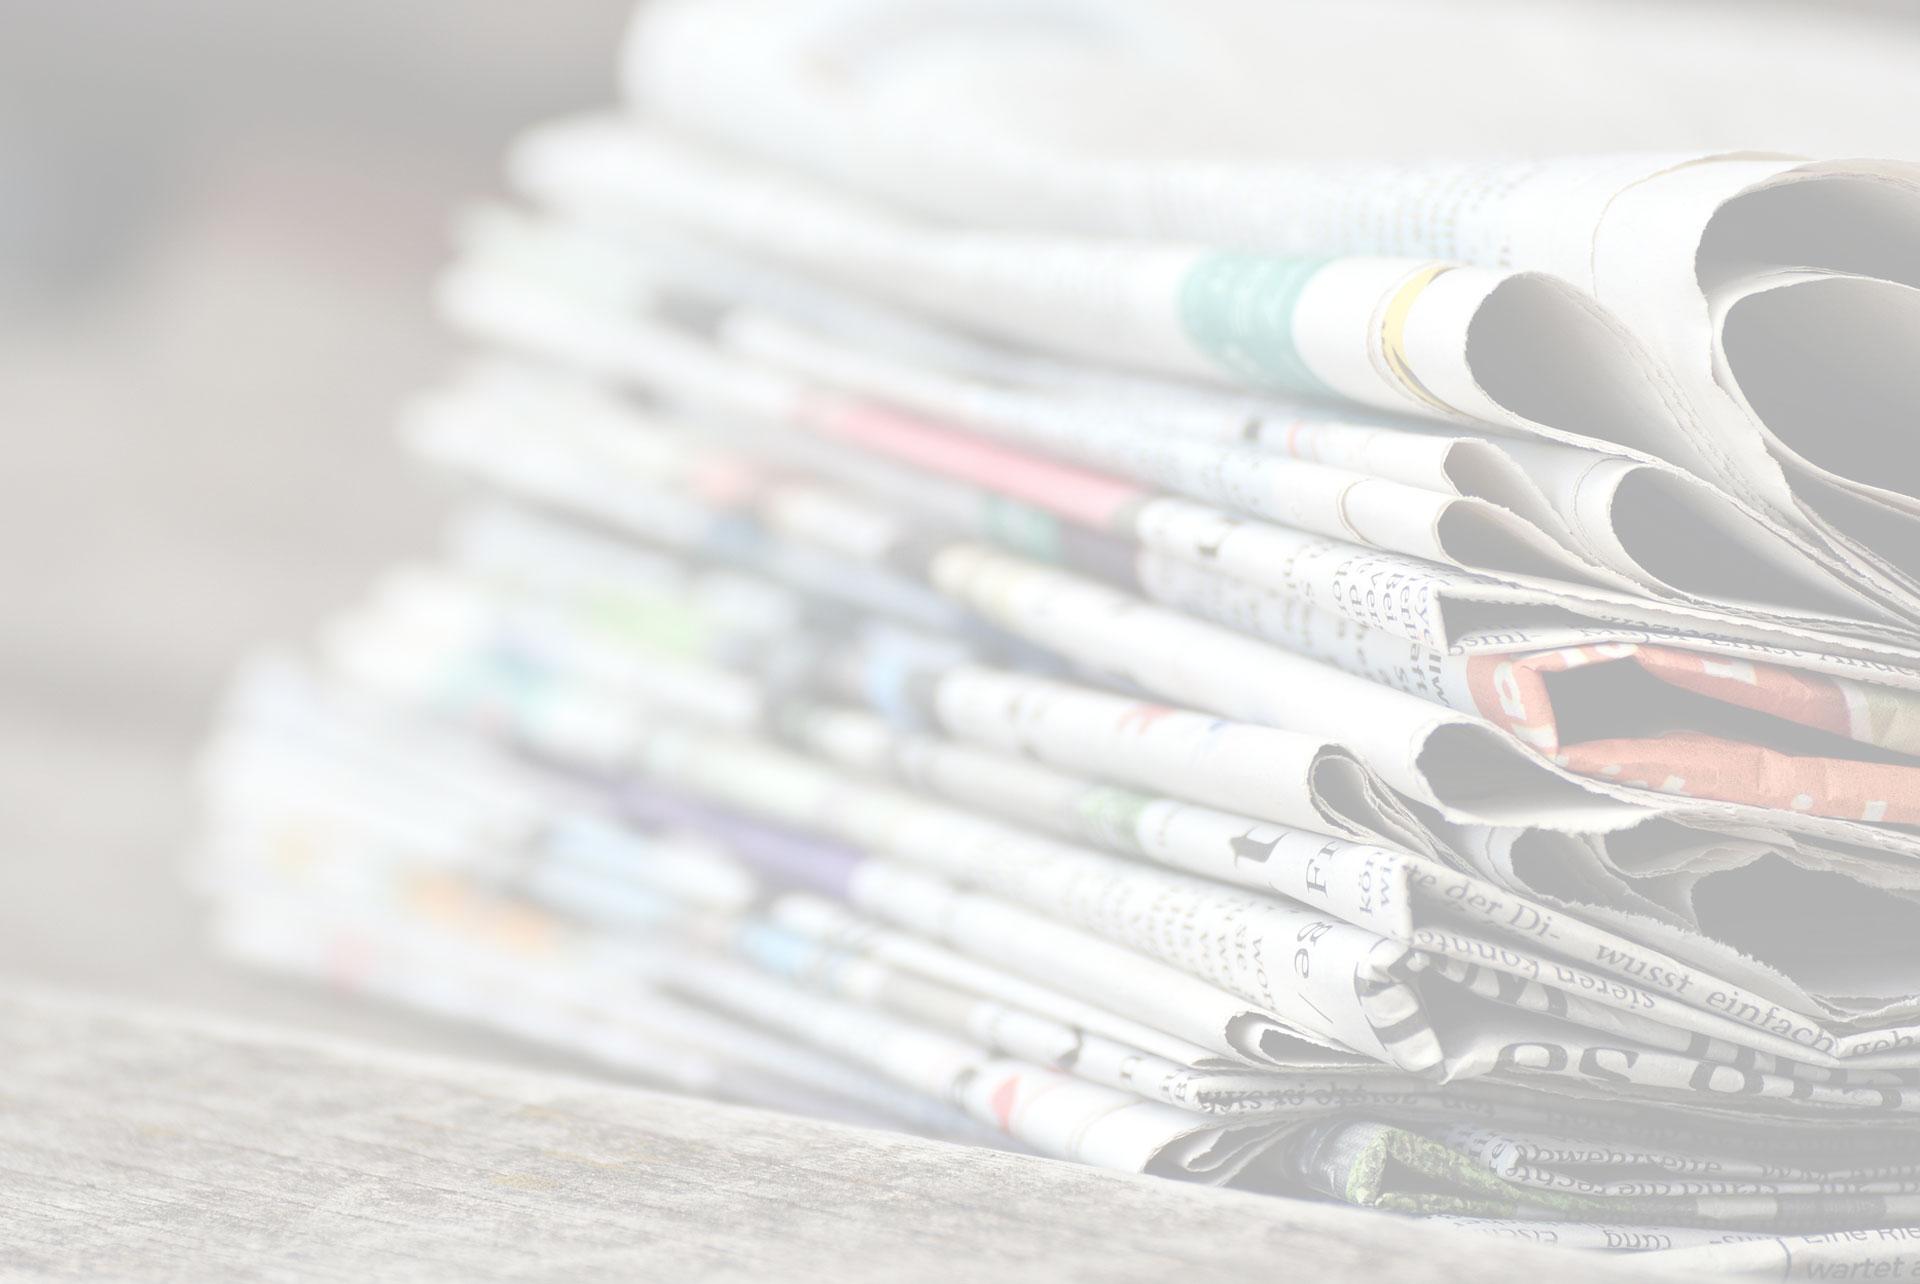 Dalma Caneva